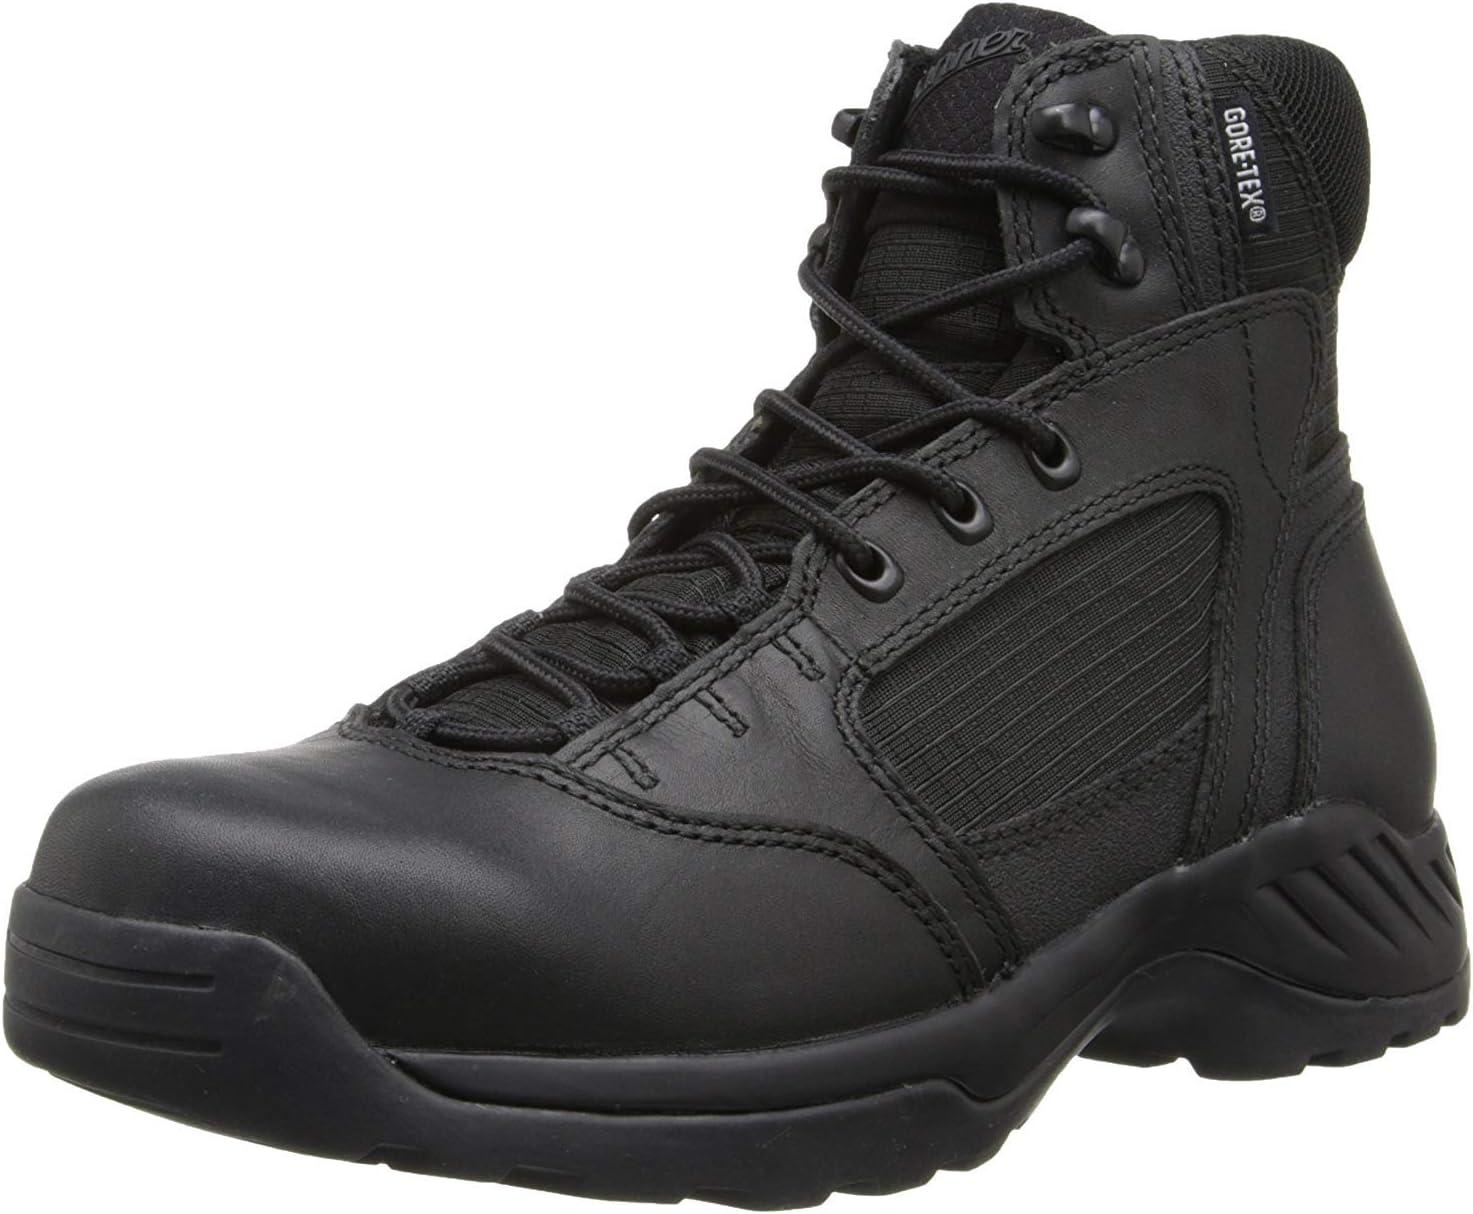 Danner Men's Kinetic 6 Inch GTX 10. Boot Enforcement Law 2021 autumn and winter new Black famous